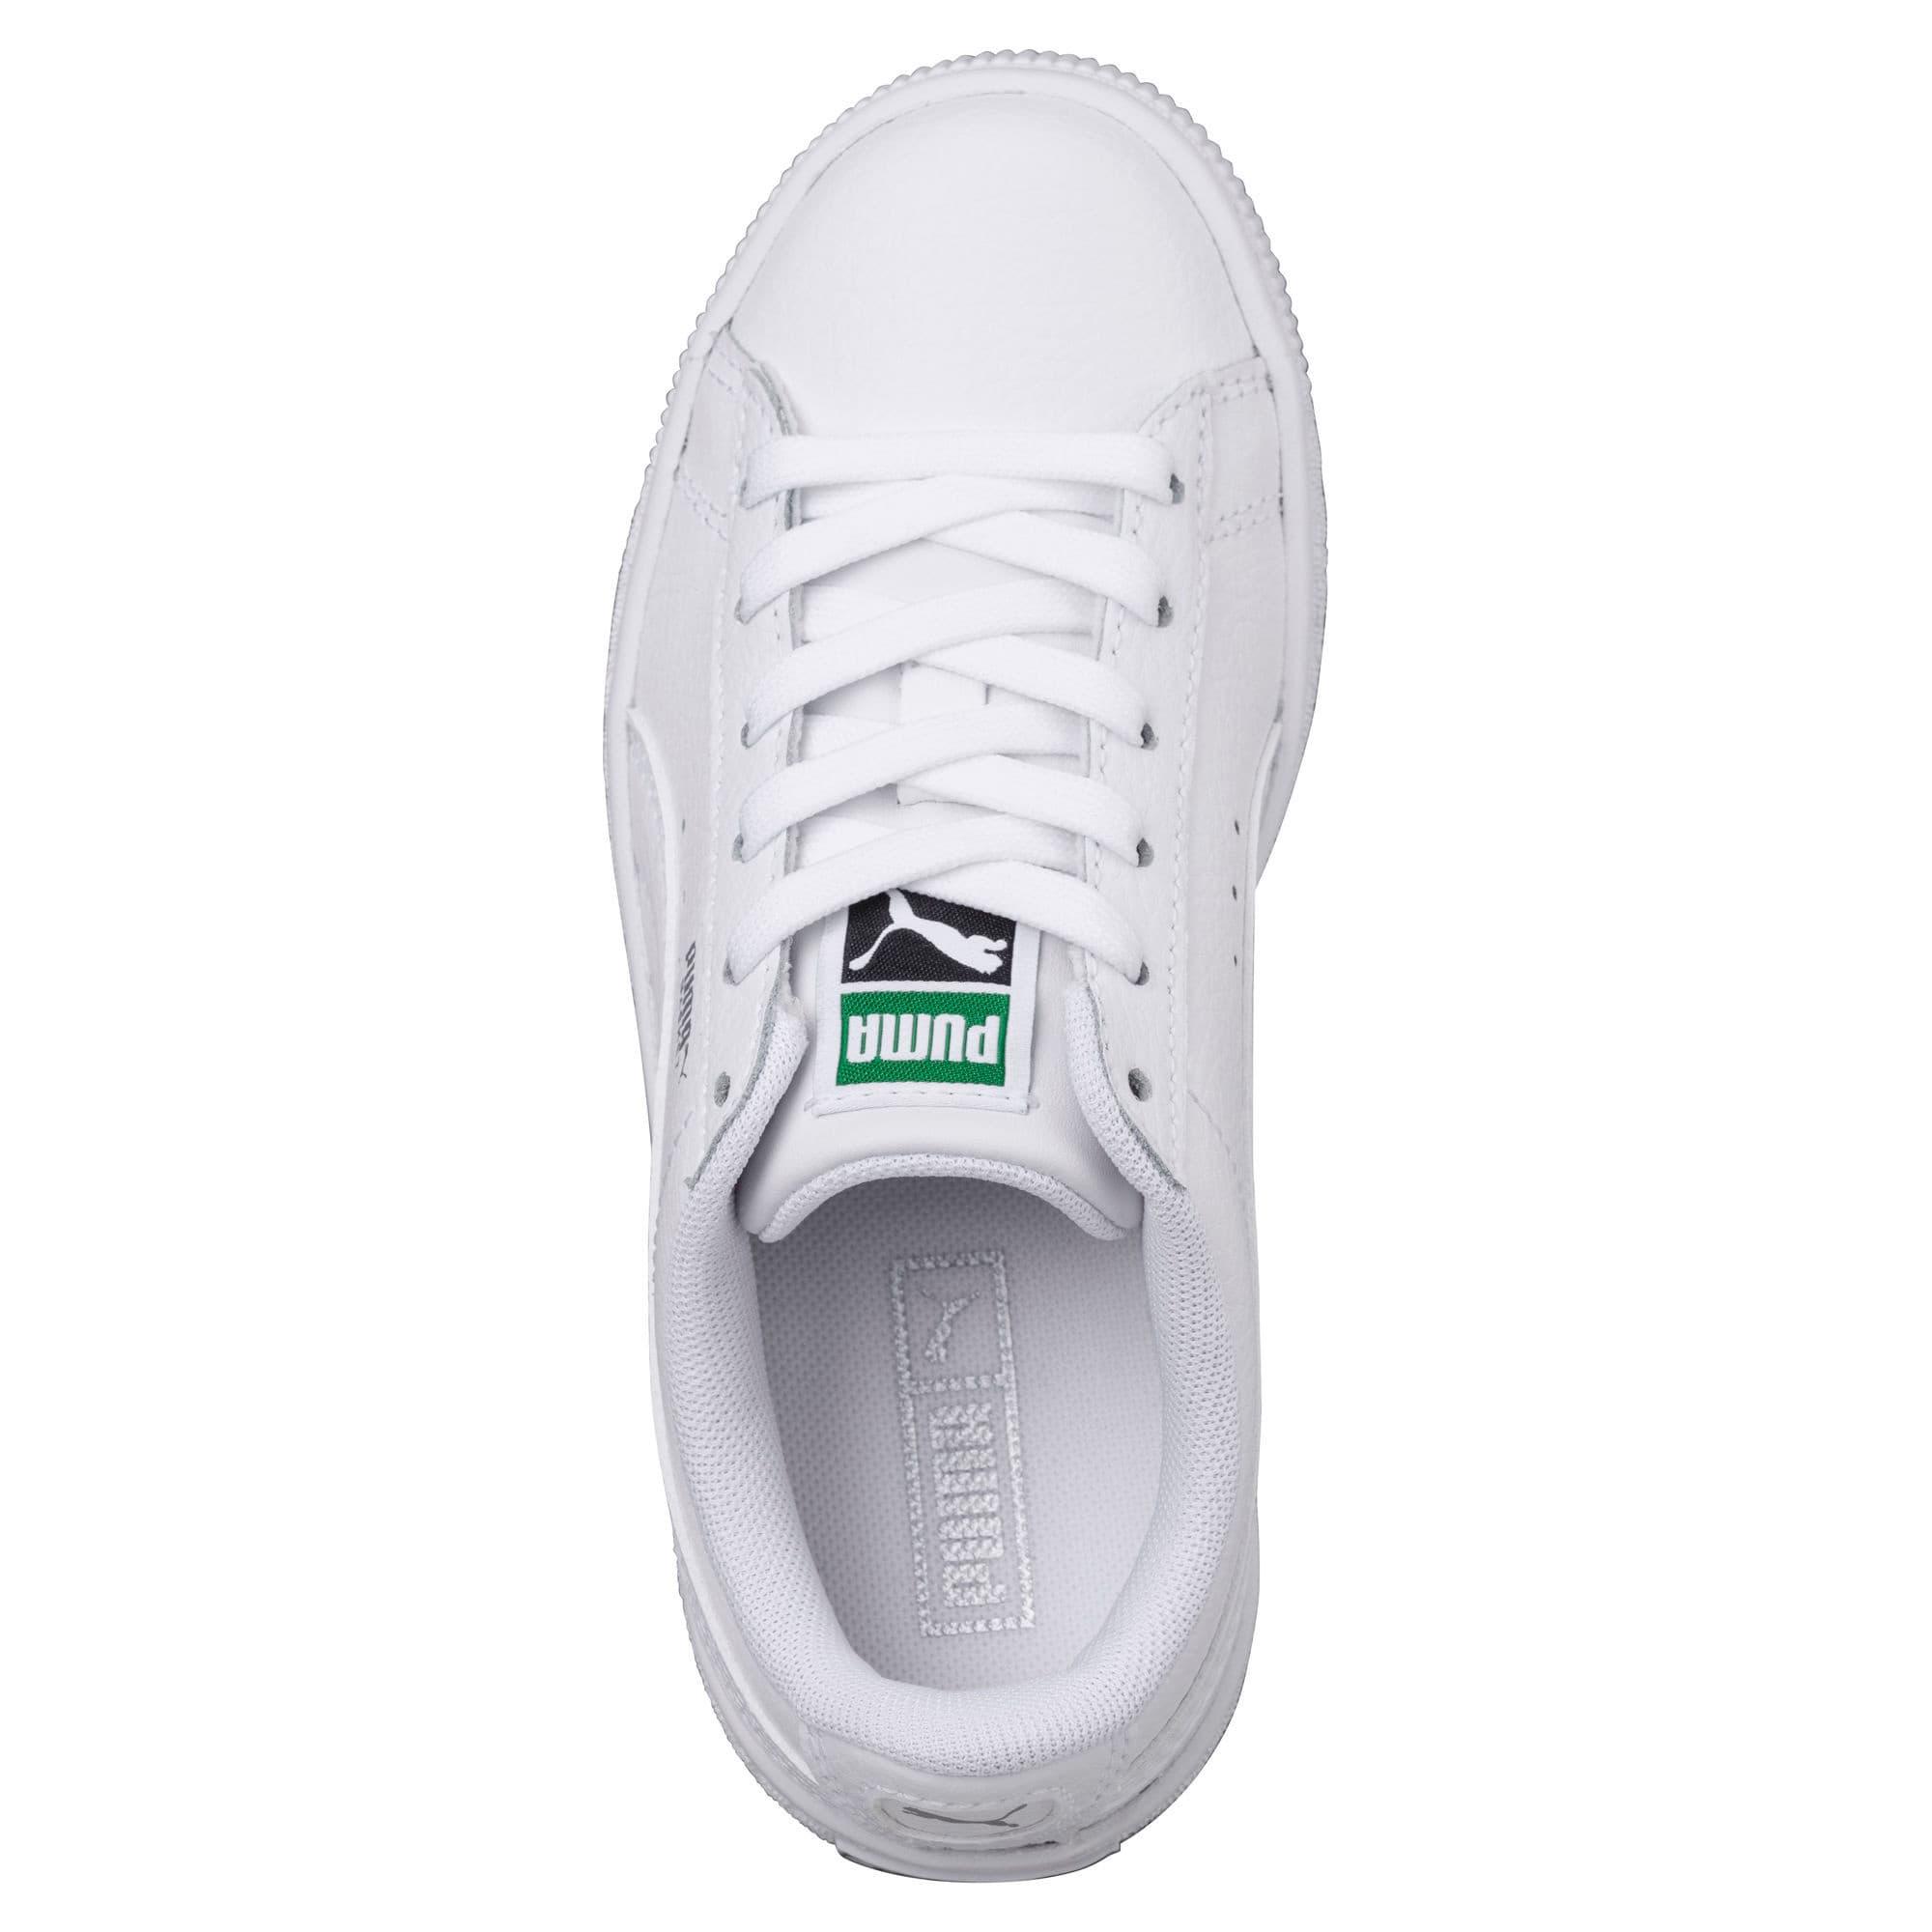 Thumbnail 5 of Basket Classic Sneakers JR, Puma White-Puma White, medium